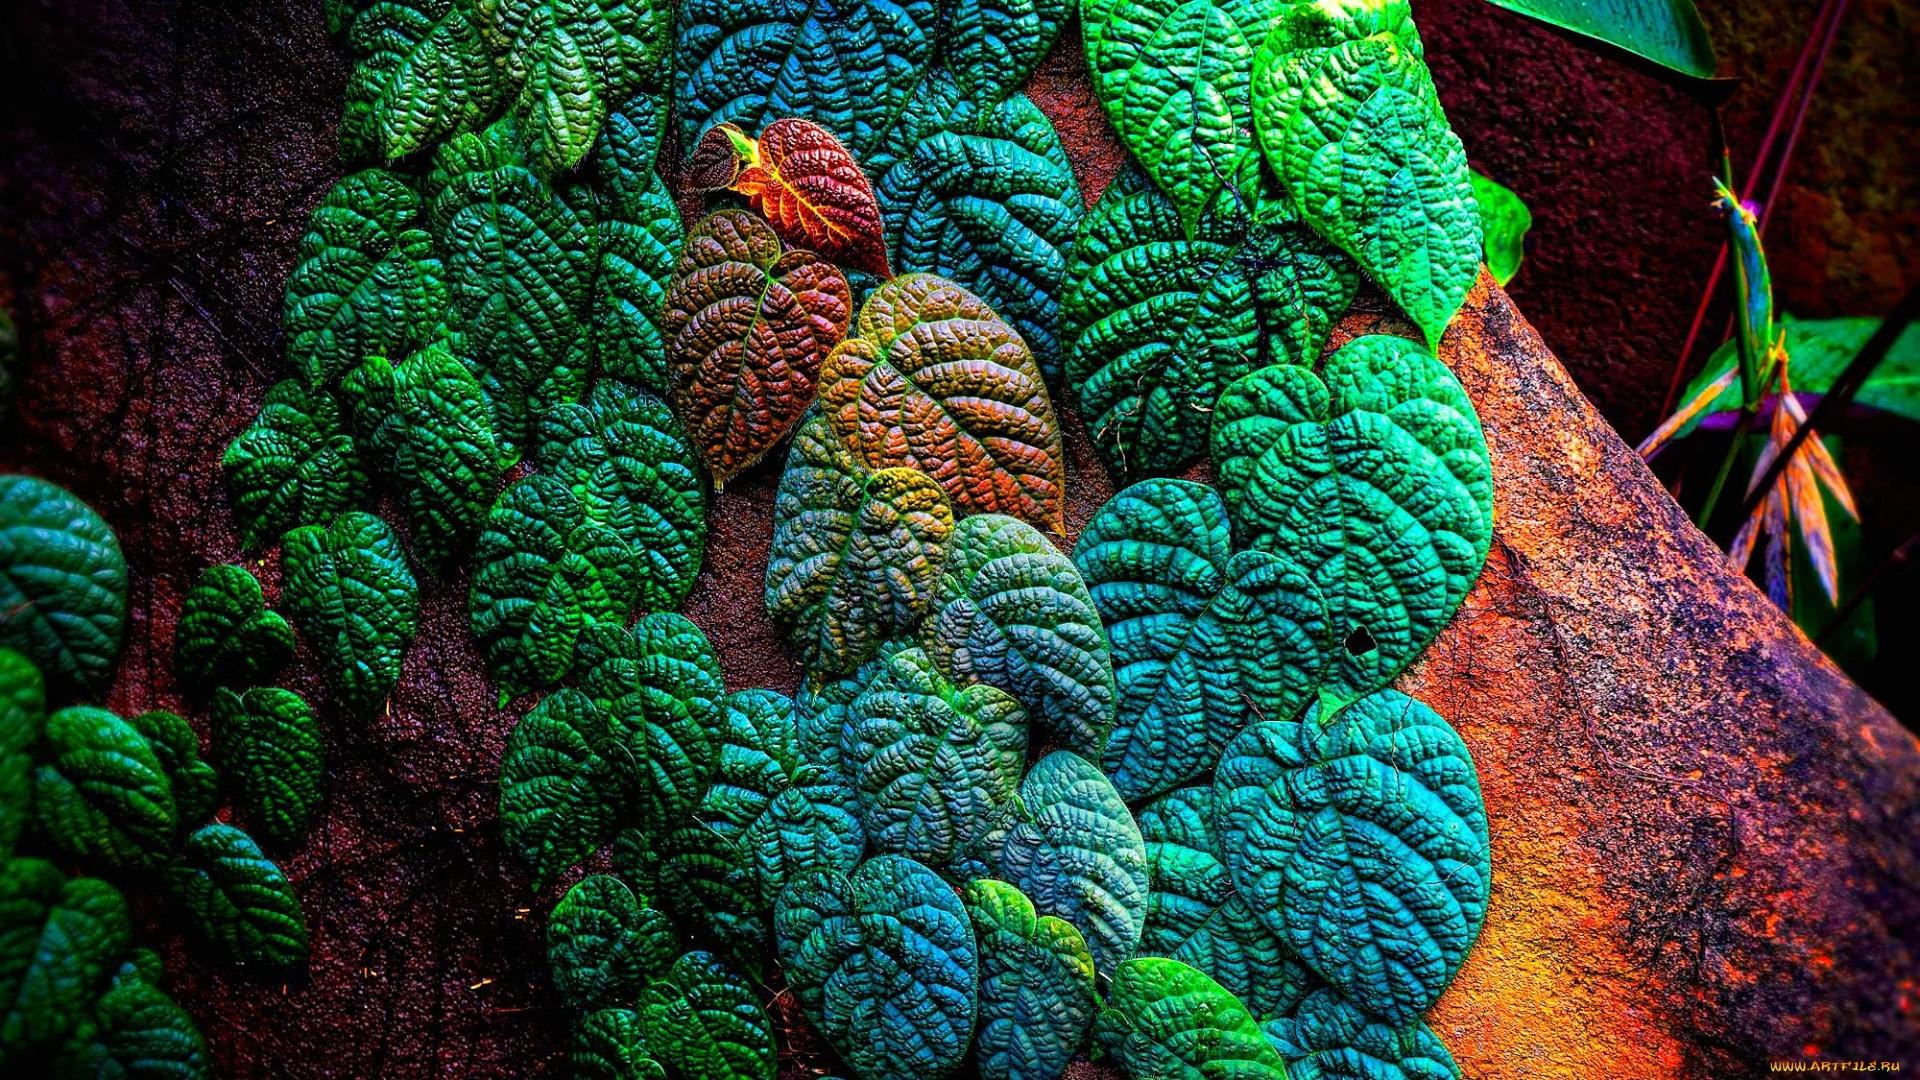 Tropical Leaf Wallpaper image hd